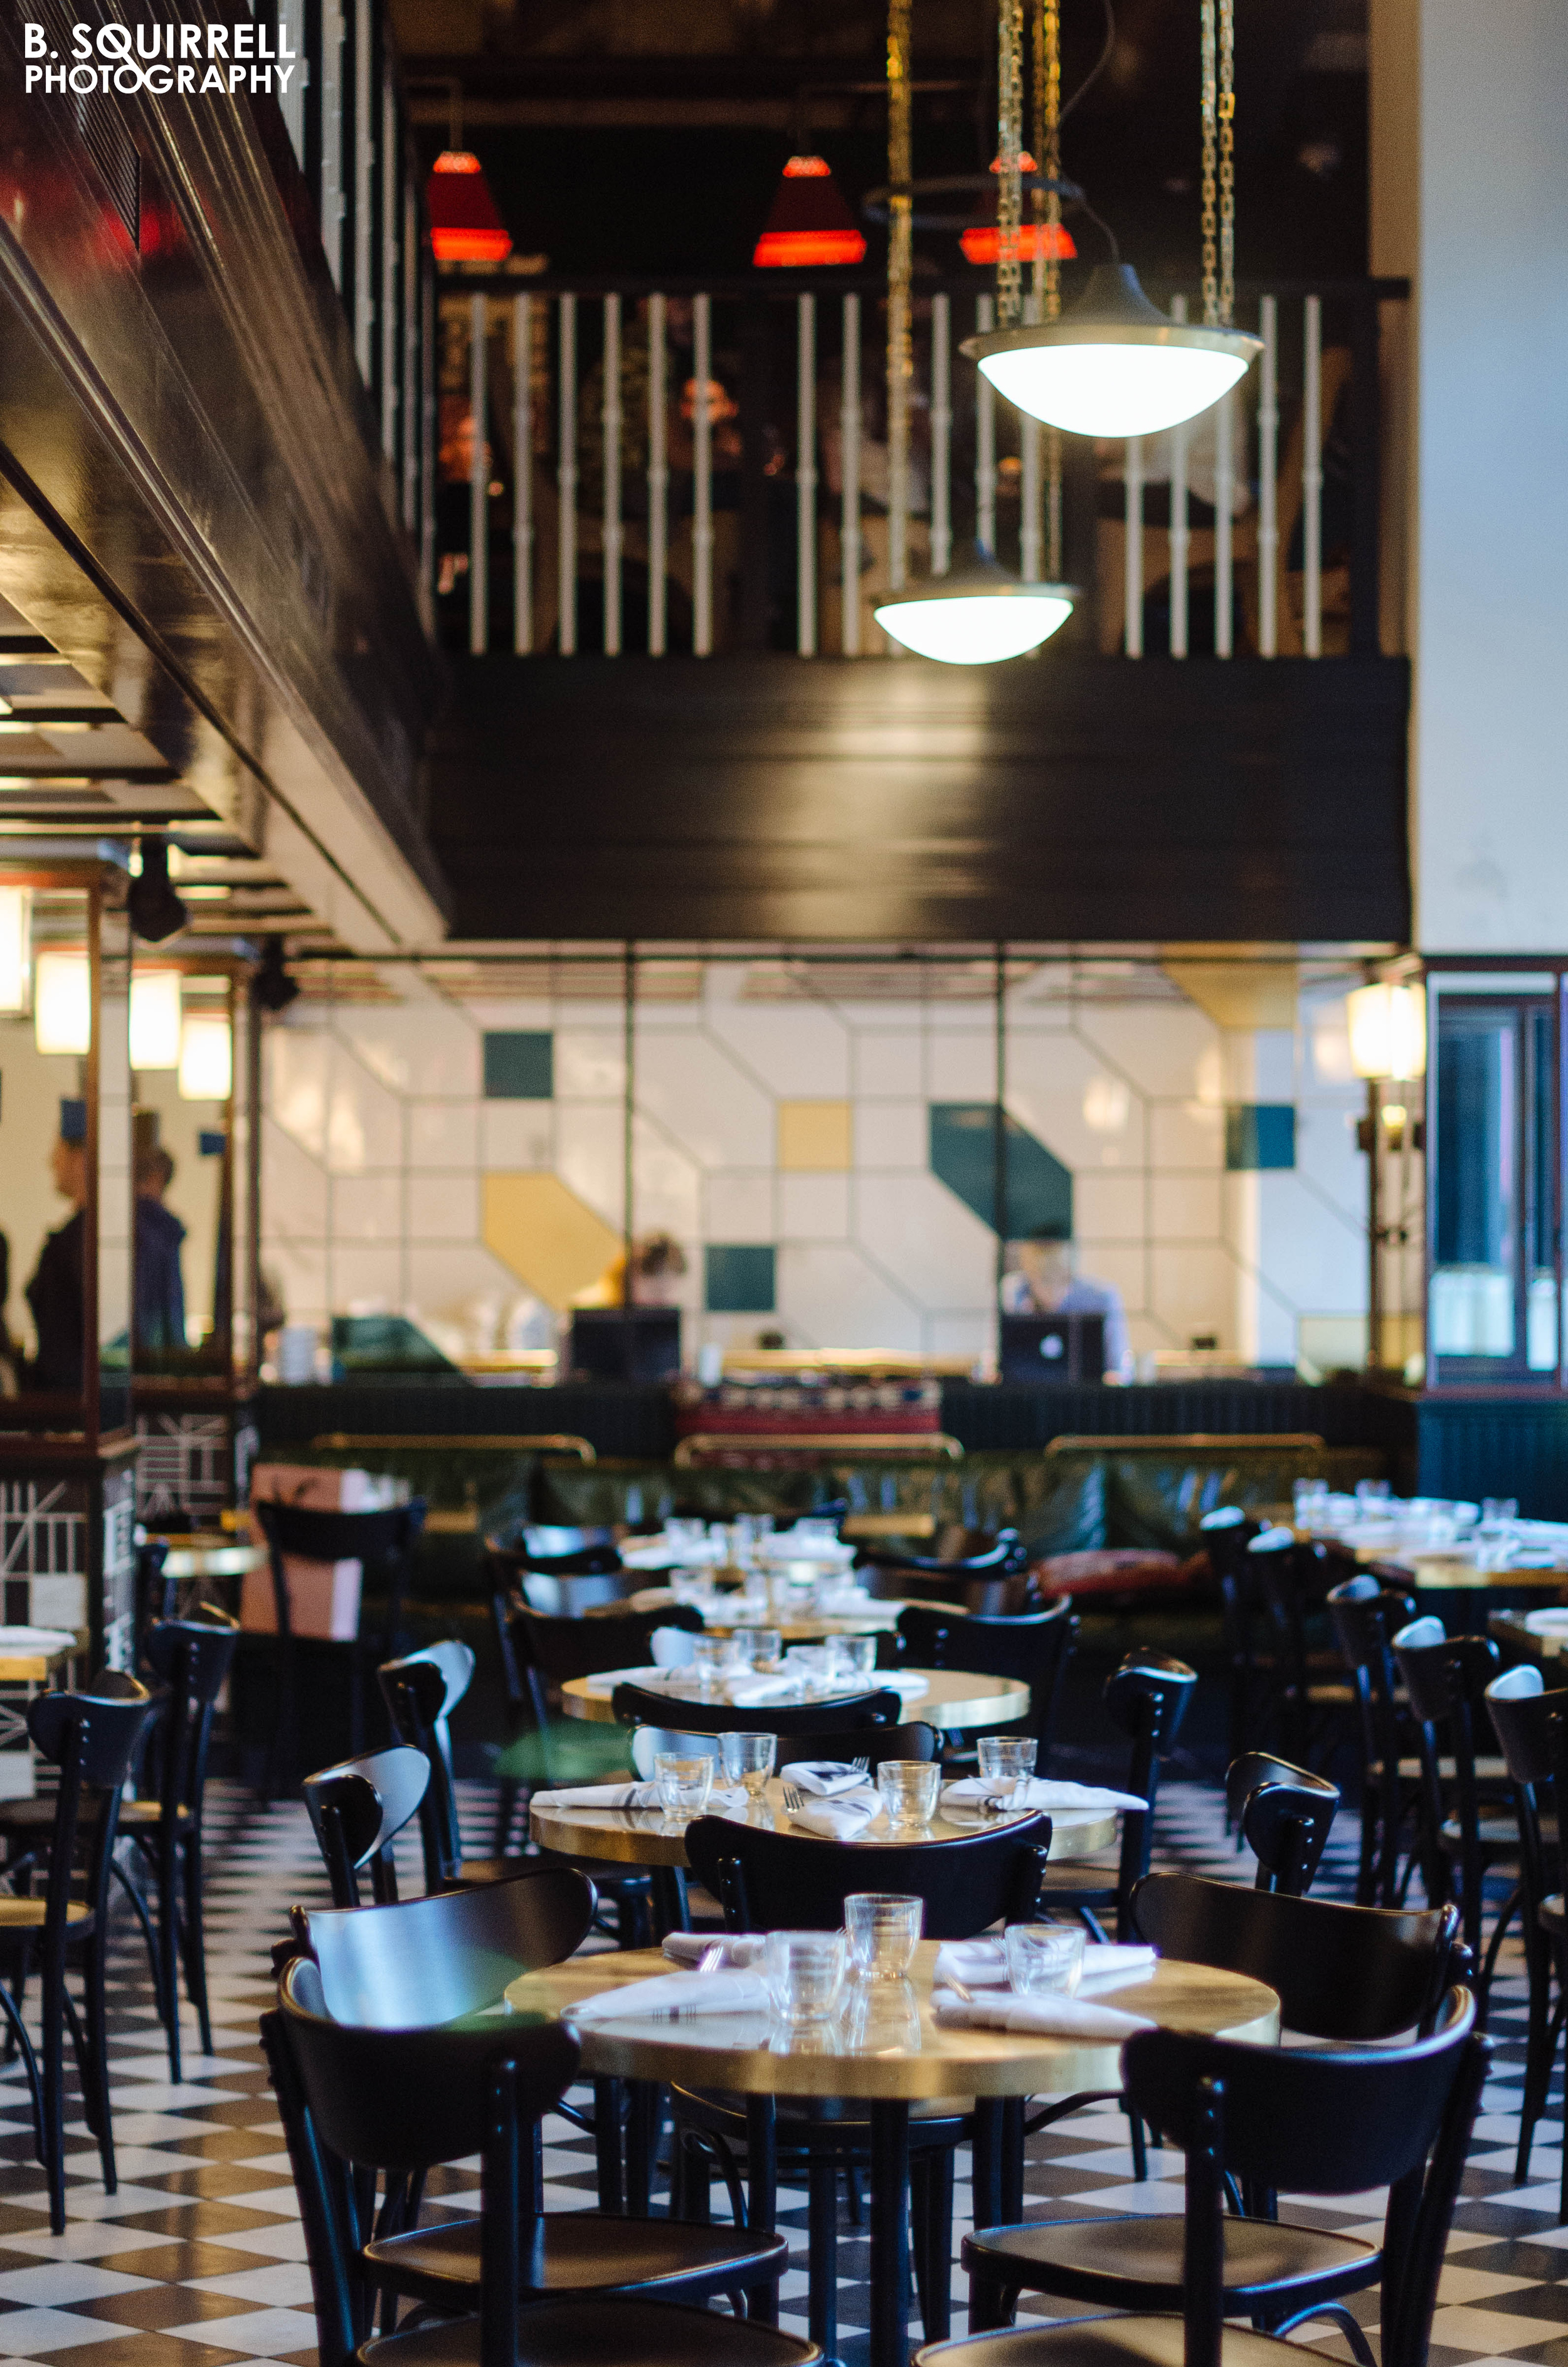 scoutfolks_blog_LA Chapter Dining Room.jpg